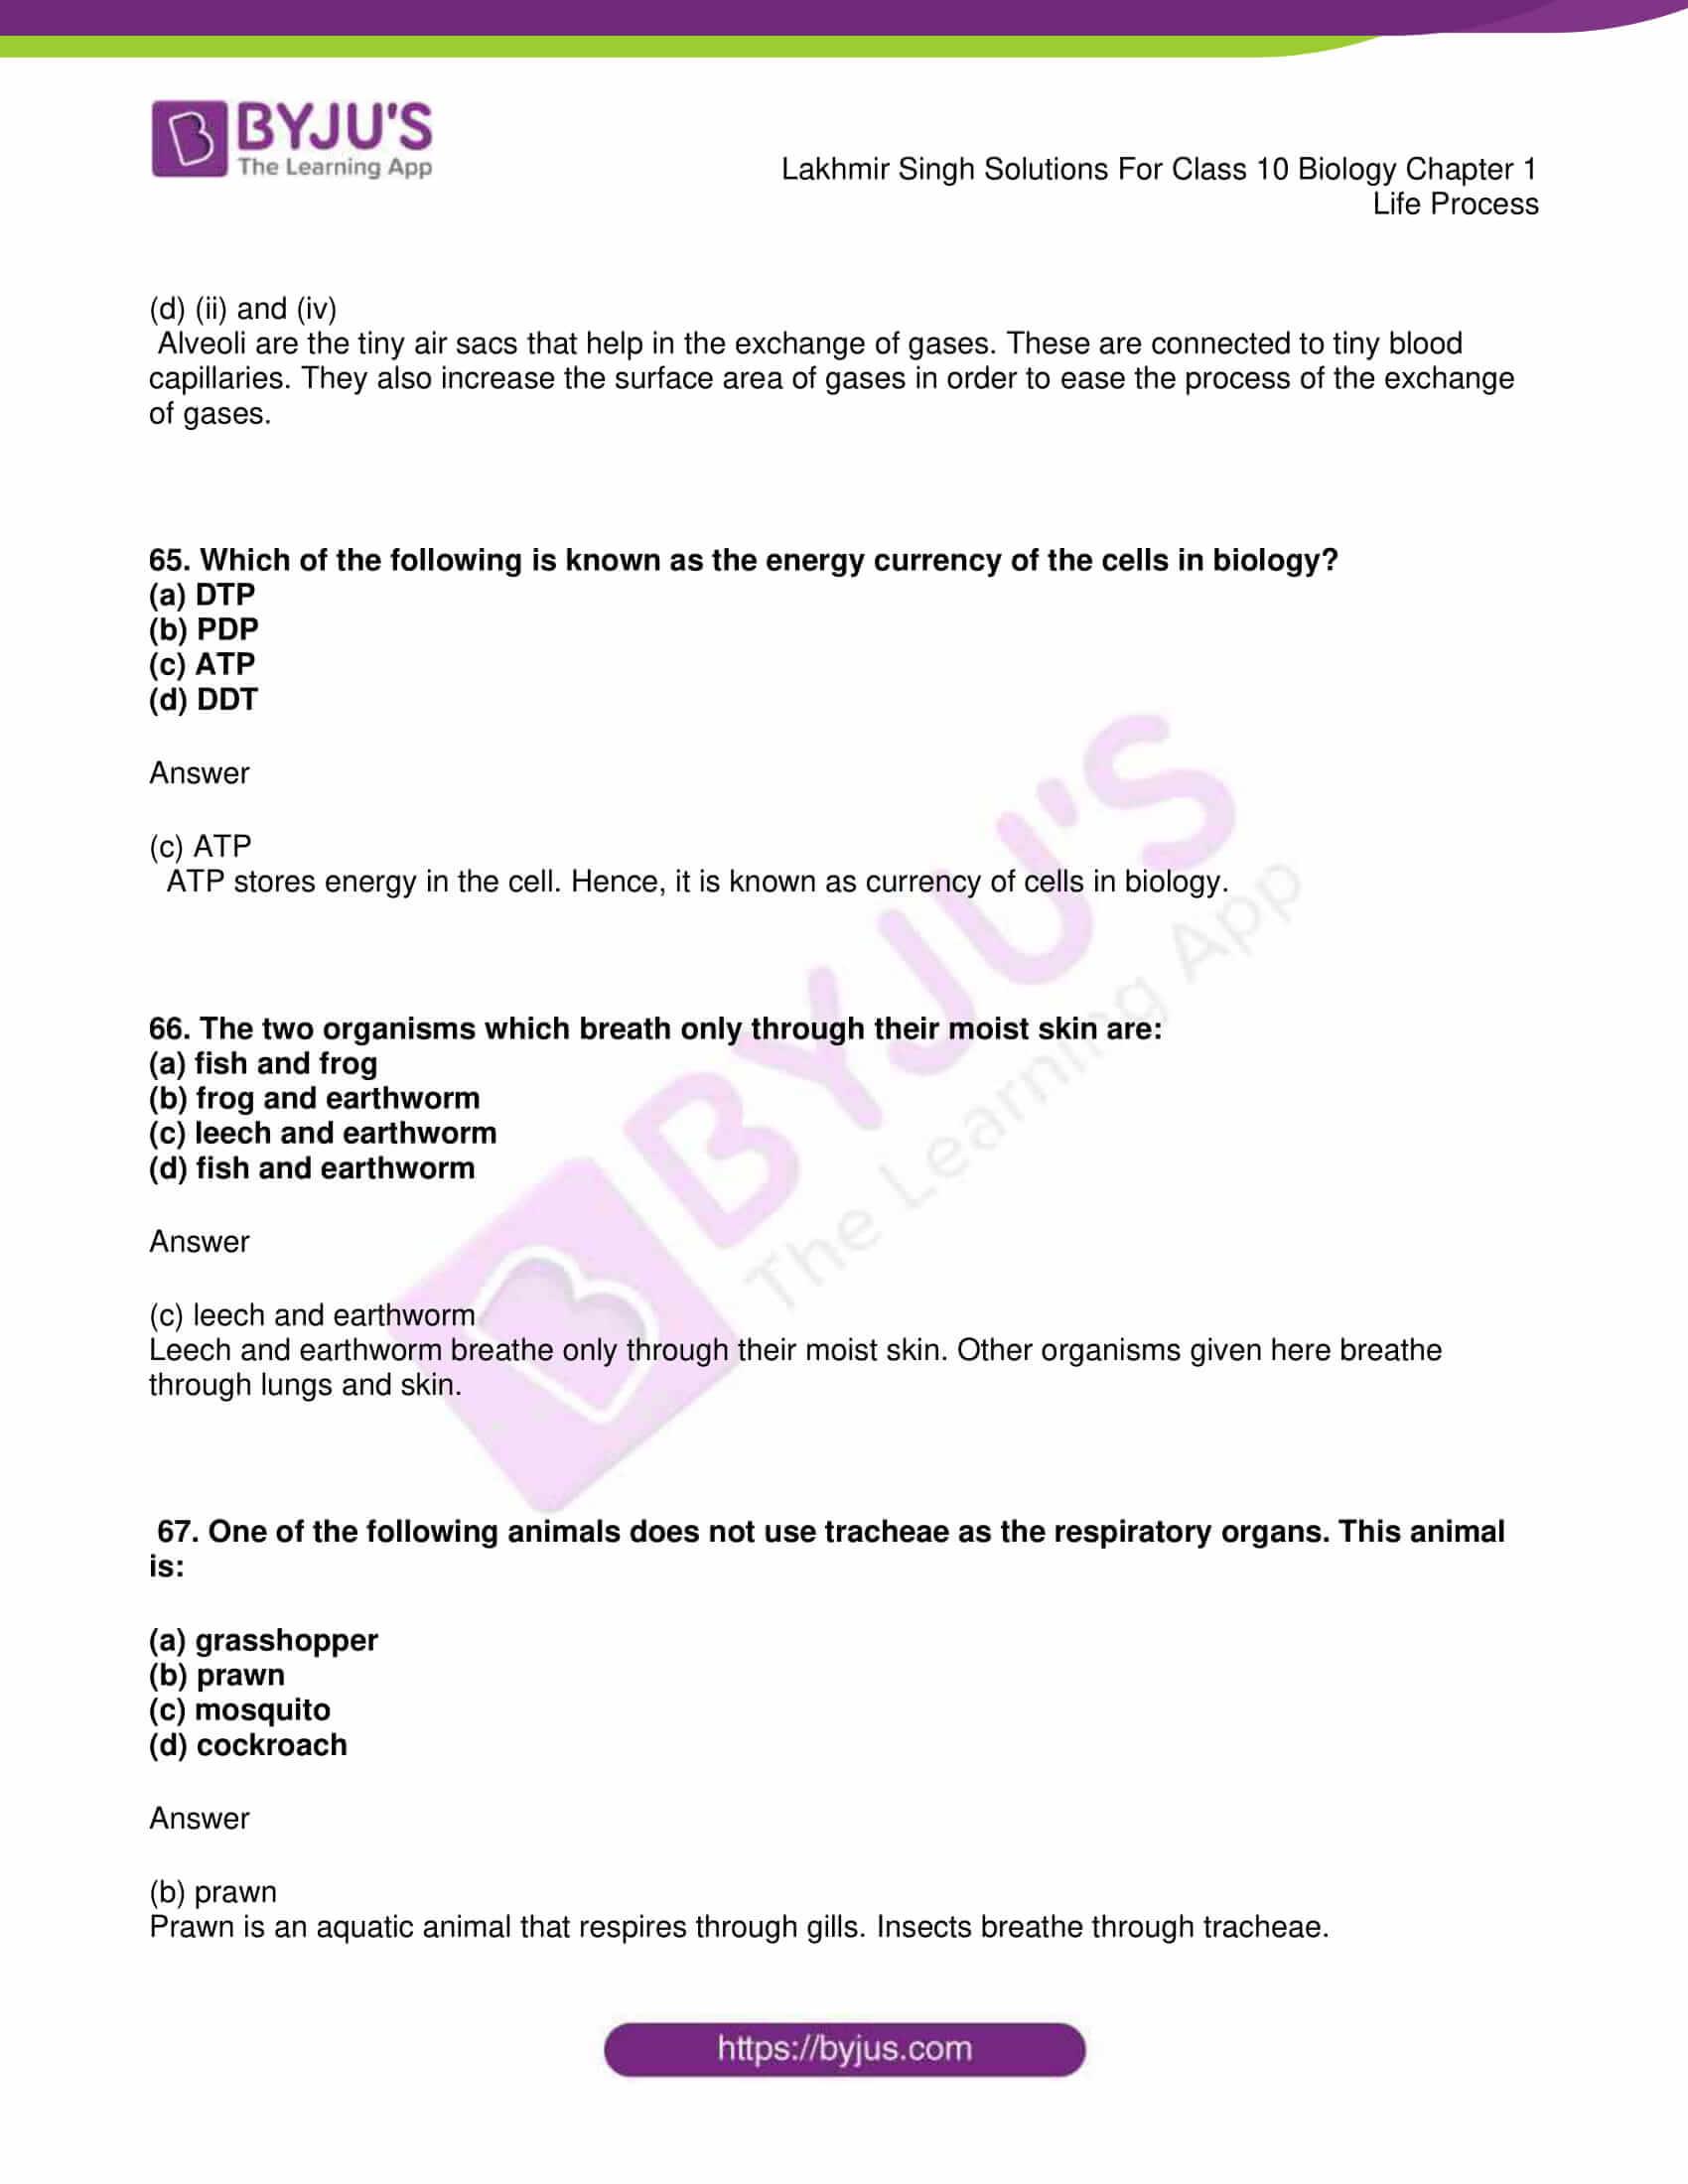 lakhmir singh sol class 10 biology chapter 1 52